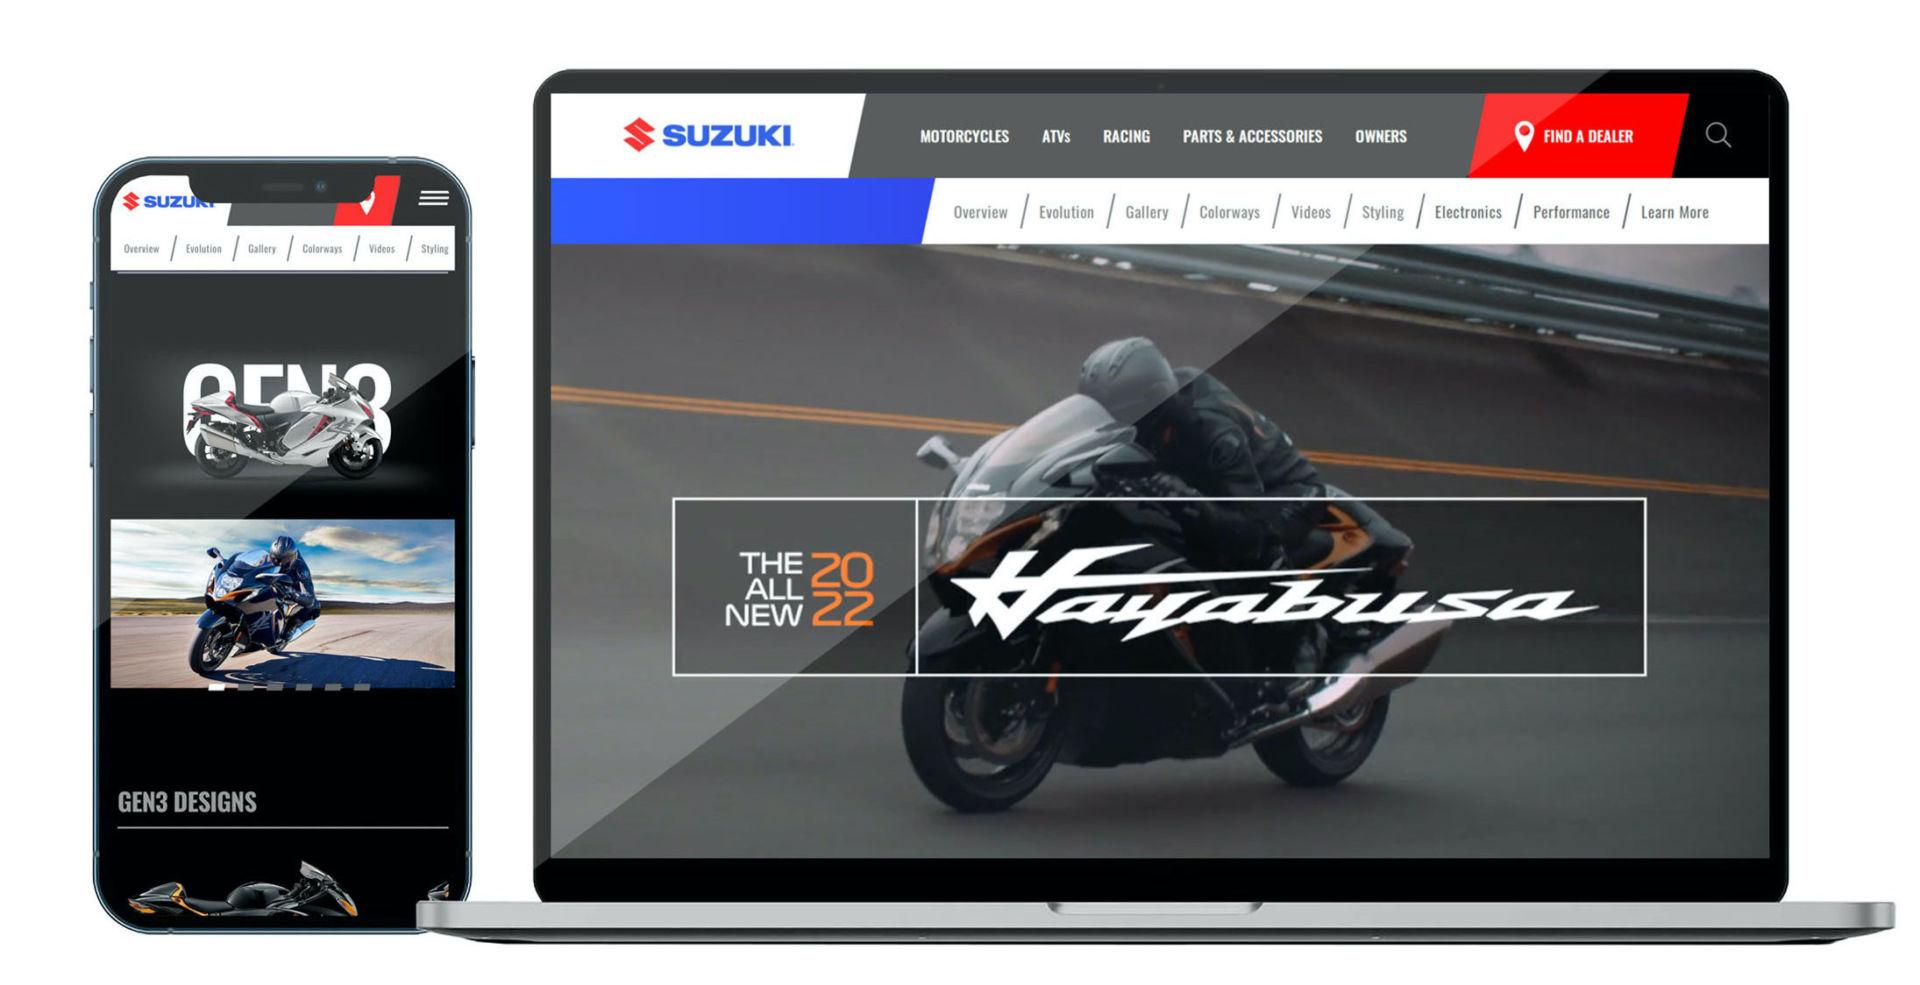 Images courtesy Suzuki Motor of America, Inc.